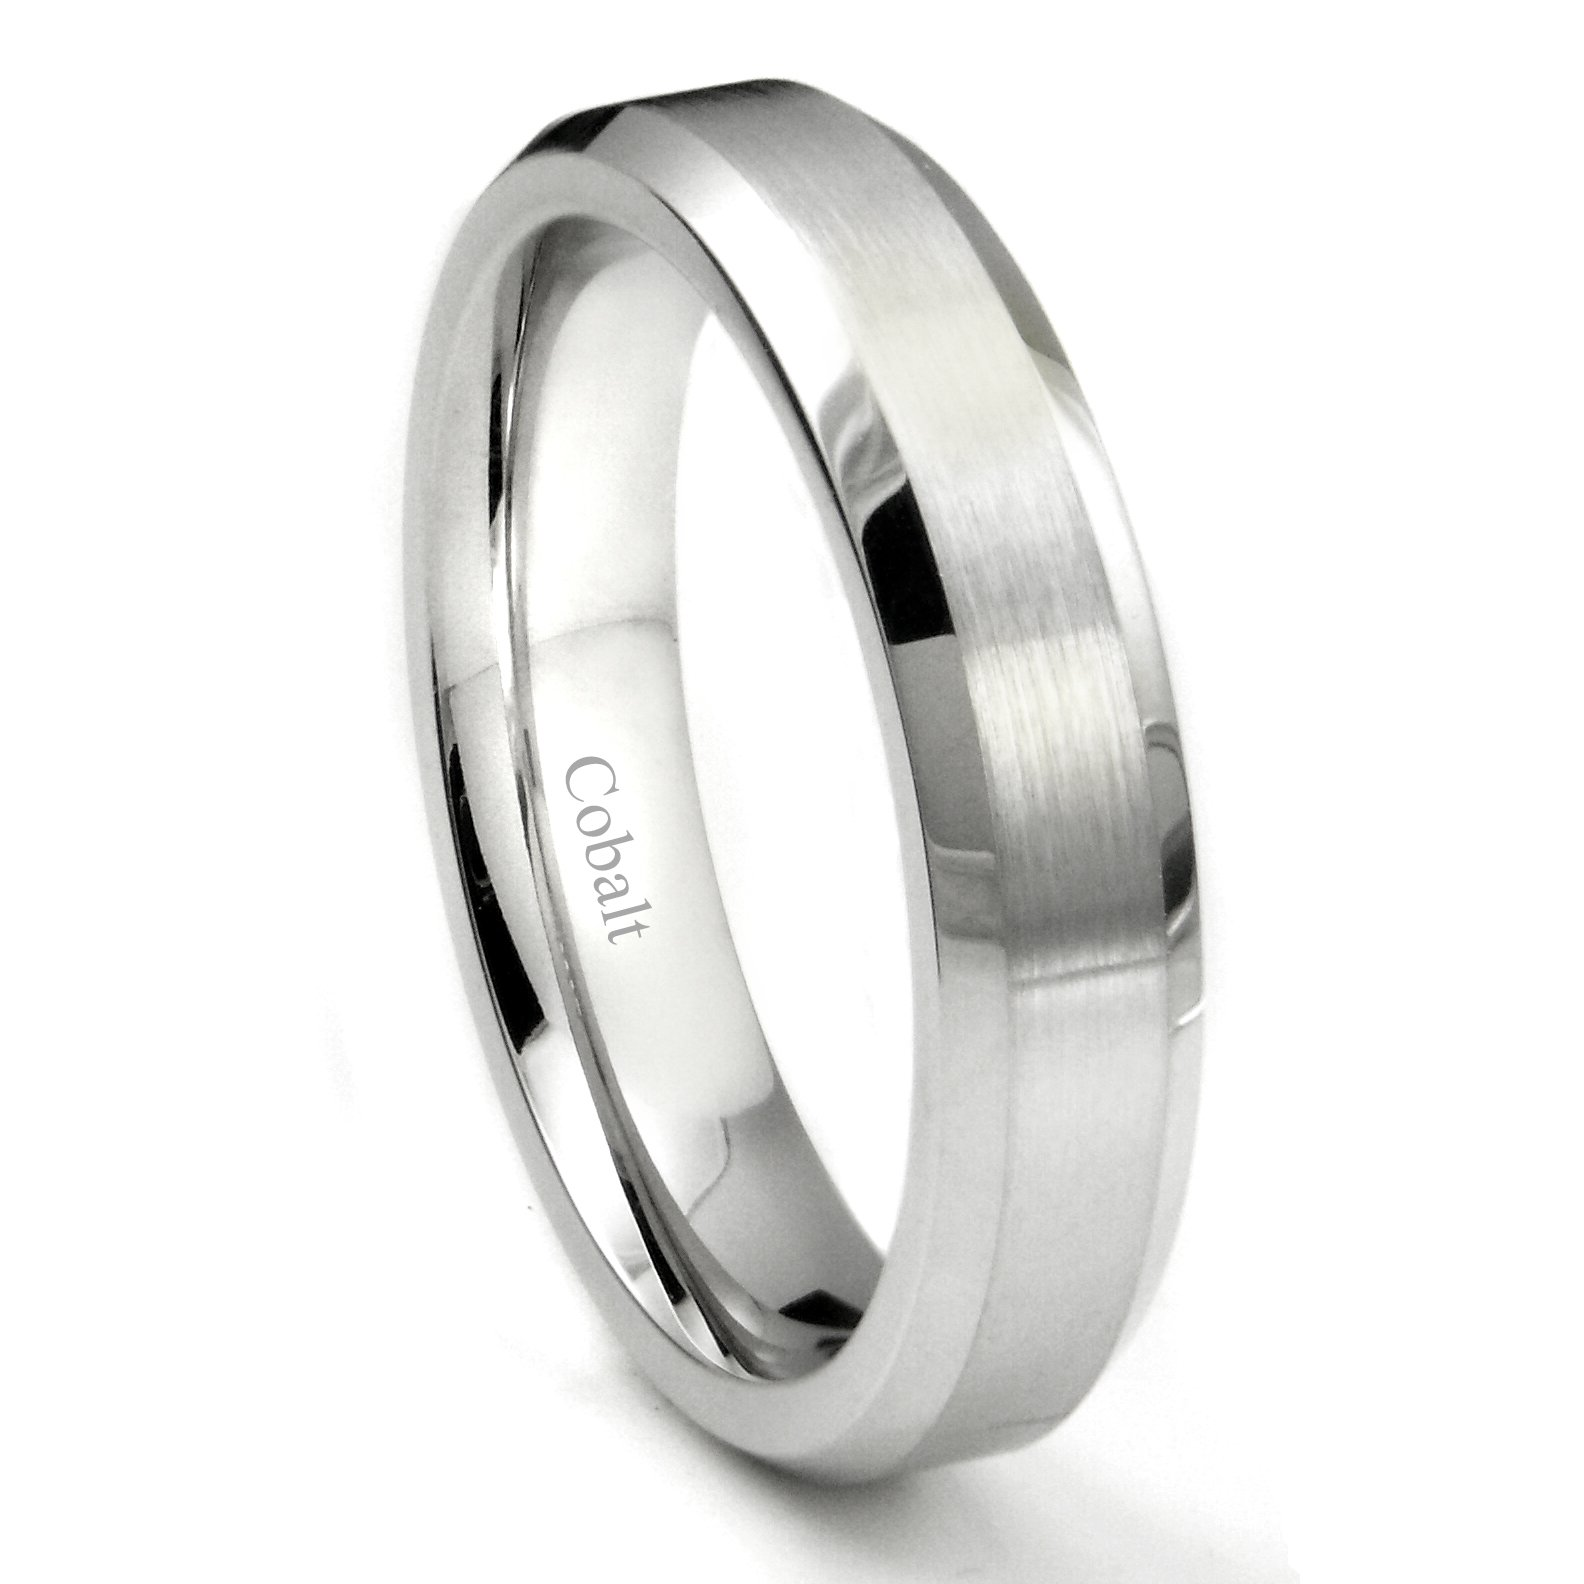 Cobalt XF Chrome 5MM Brush Center Wedding Band Ring w/ Beveled Edges Sz 10.0